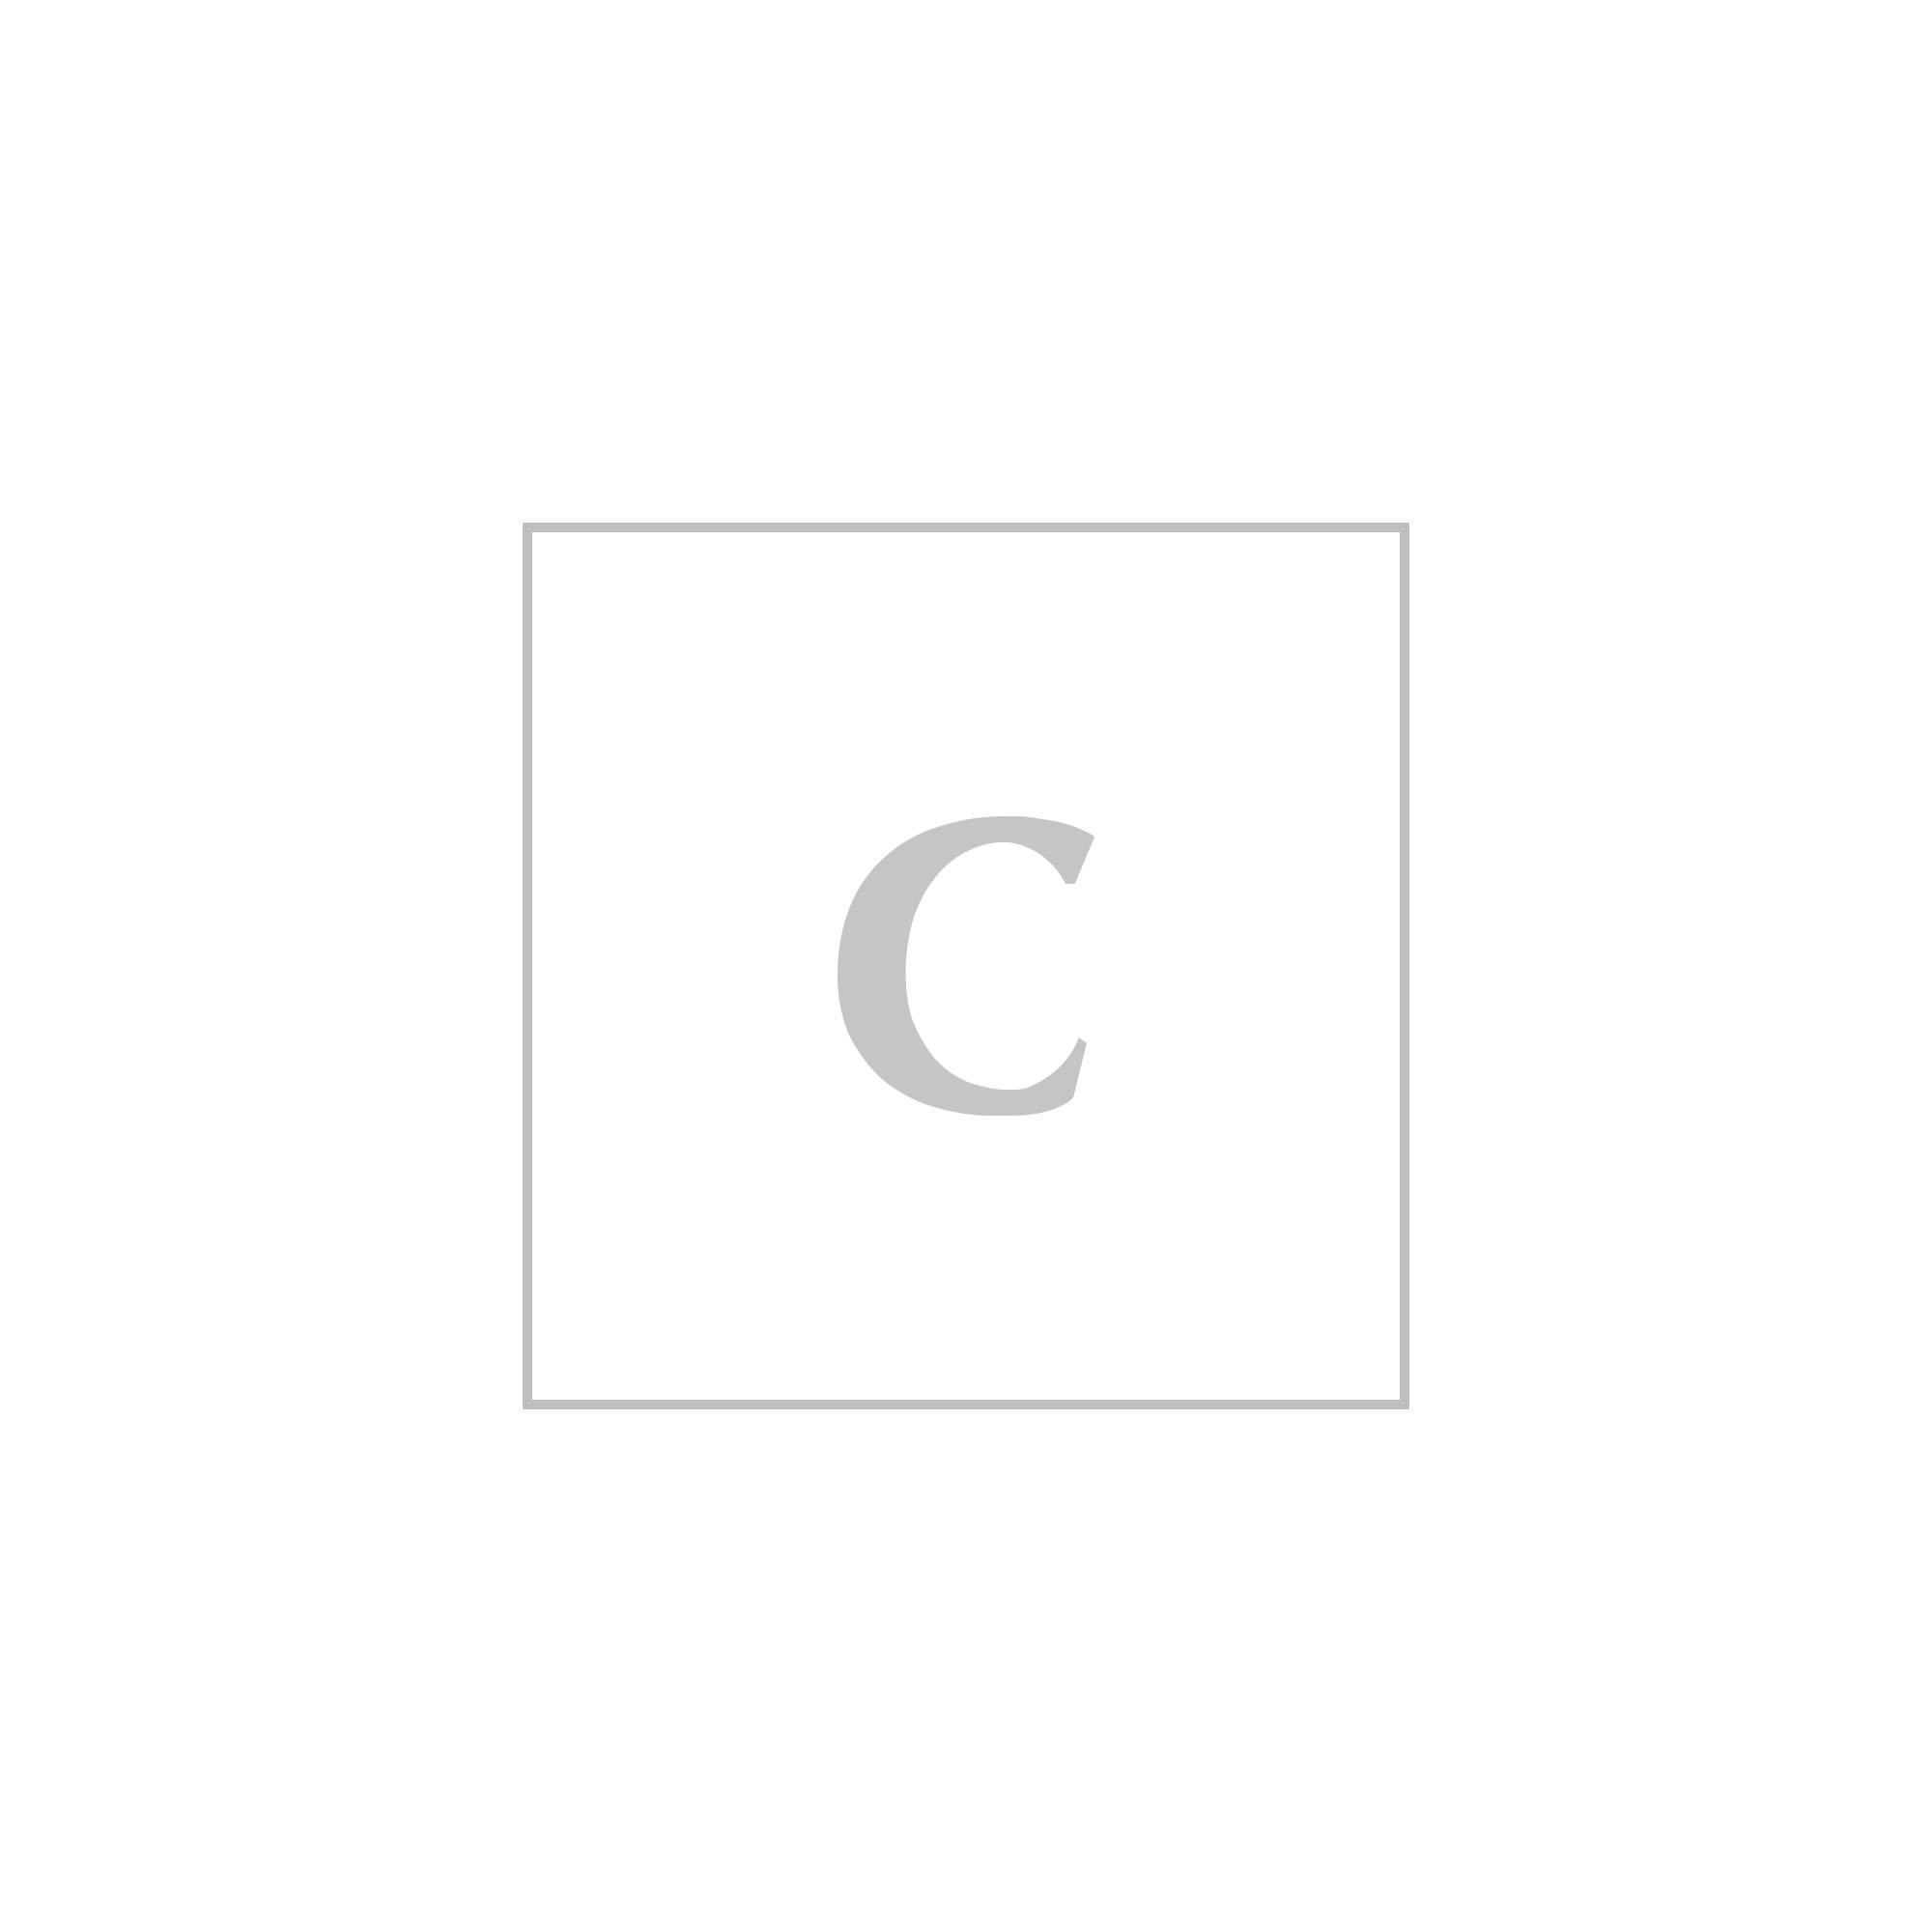 Moncler capsule giubbotto arnaud